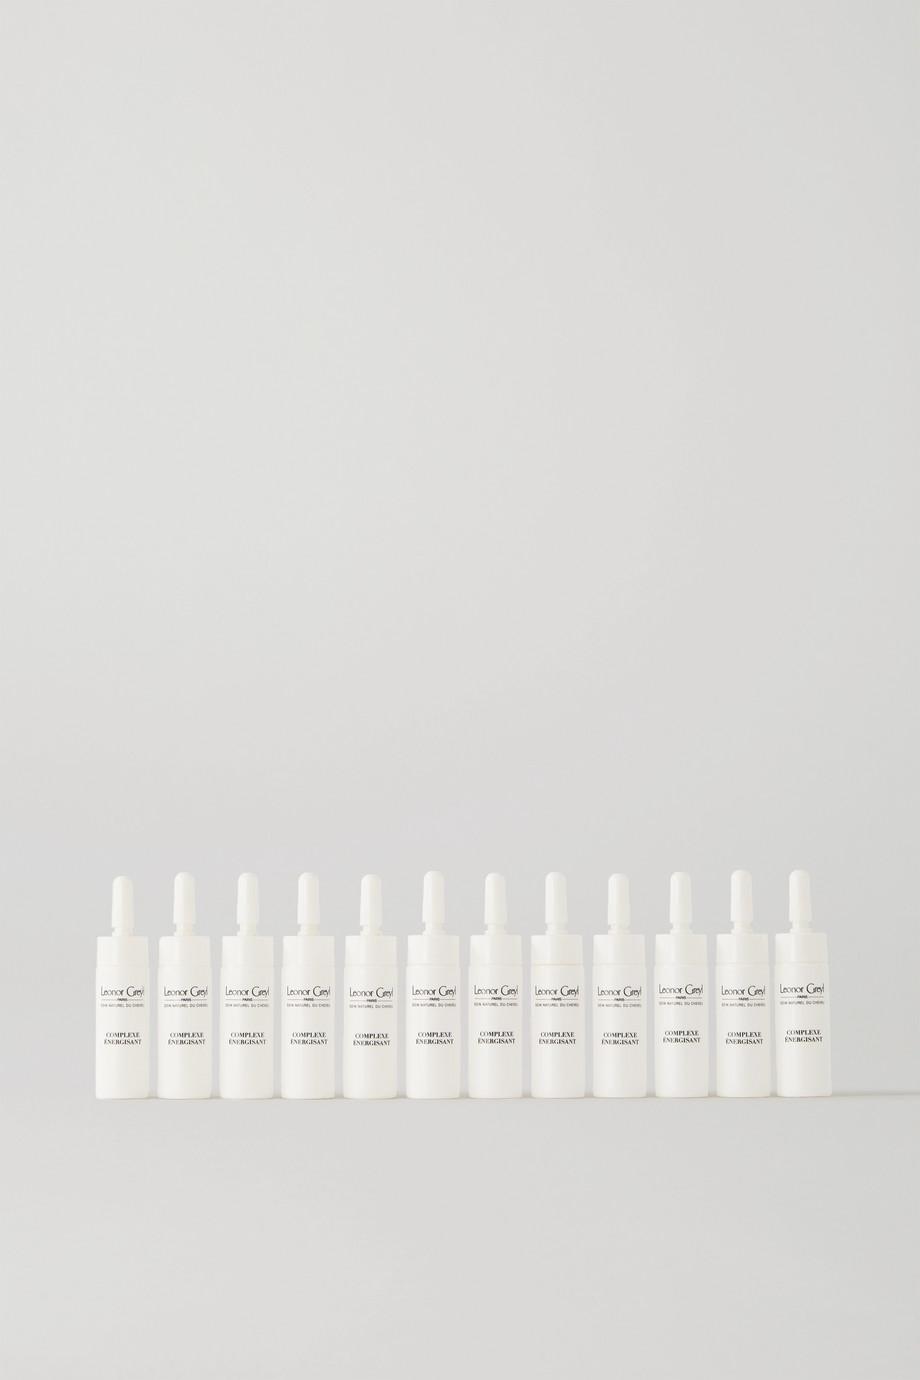 Leonor Greyl Paris Complexe Énergisant Vials, 12 x 5ml